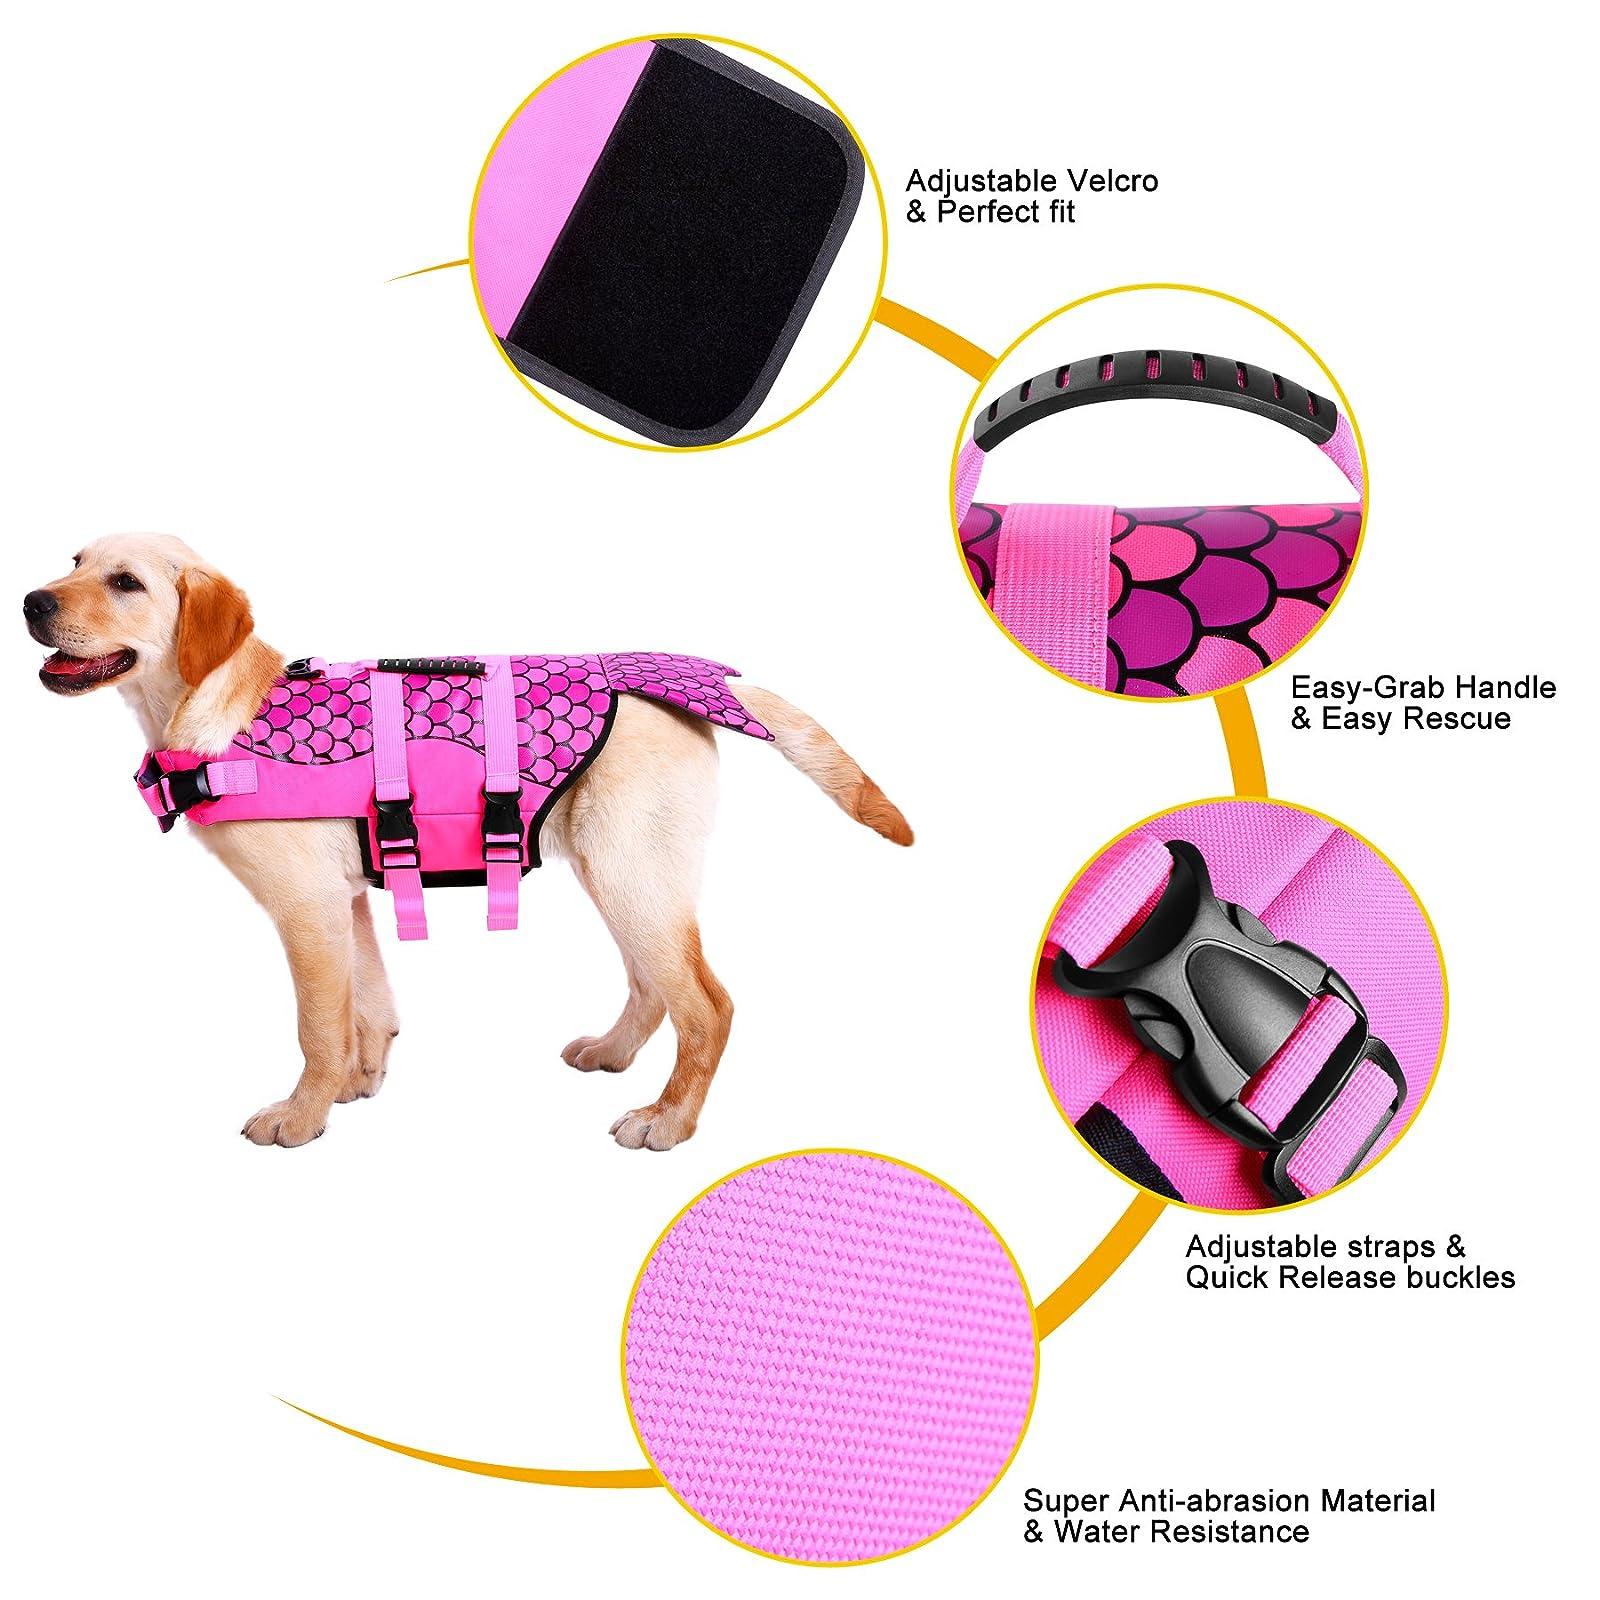 Queenmore Dog Life Jacket Ripstop Lifesaver Coat - 4